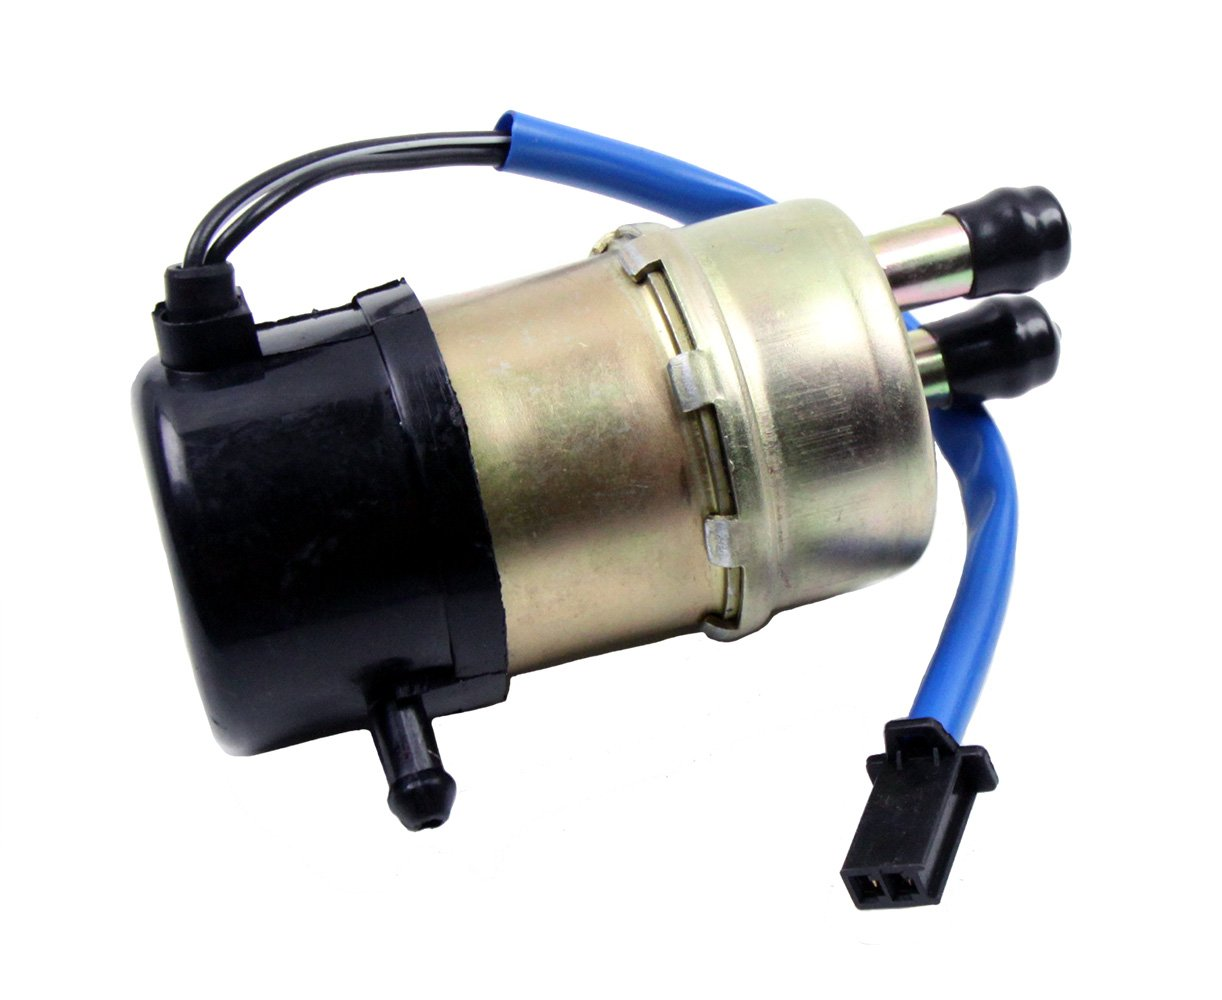 Zx7r Fuel Filter Wiring Library 2001 Passat Amazoncom Sundely 12v Heavy Duty Metal Pump For Kawasaki Ninja Zx6 Zx6r